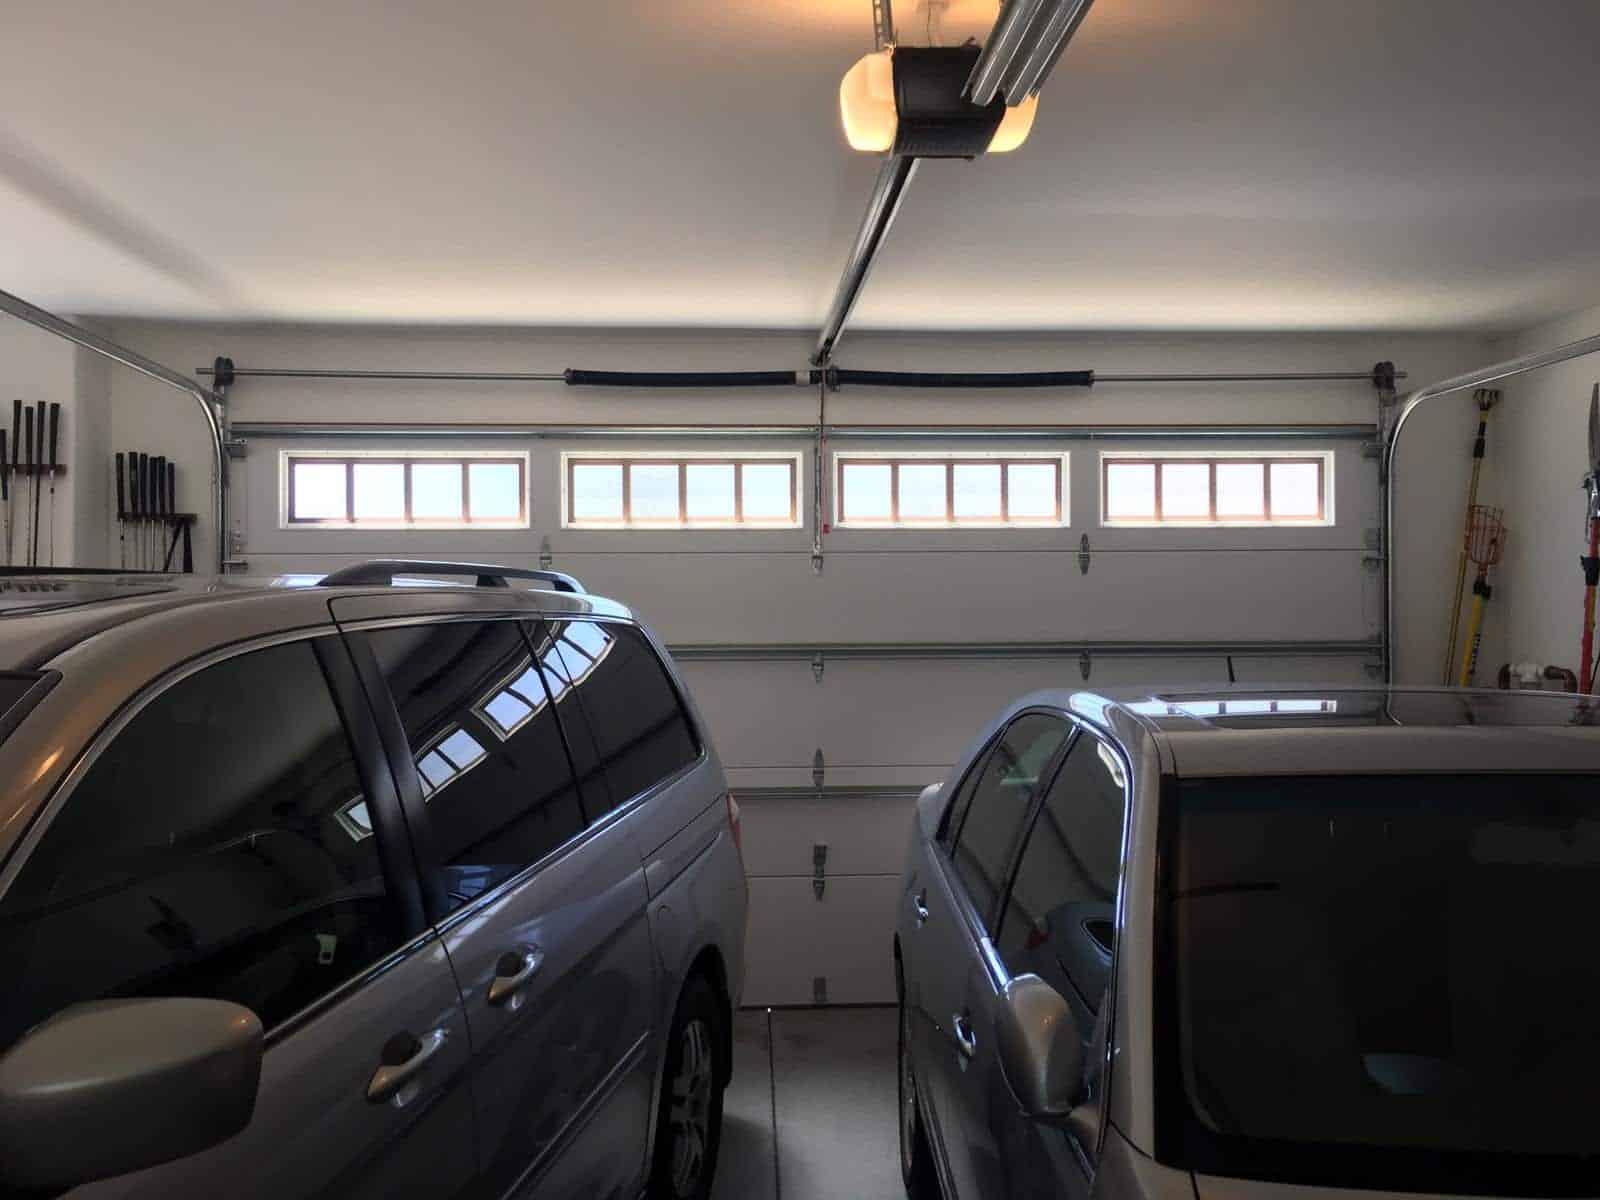 Westlake Village CA Garage Door Repair & Replacement